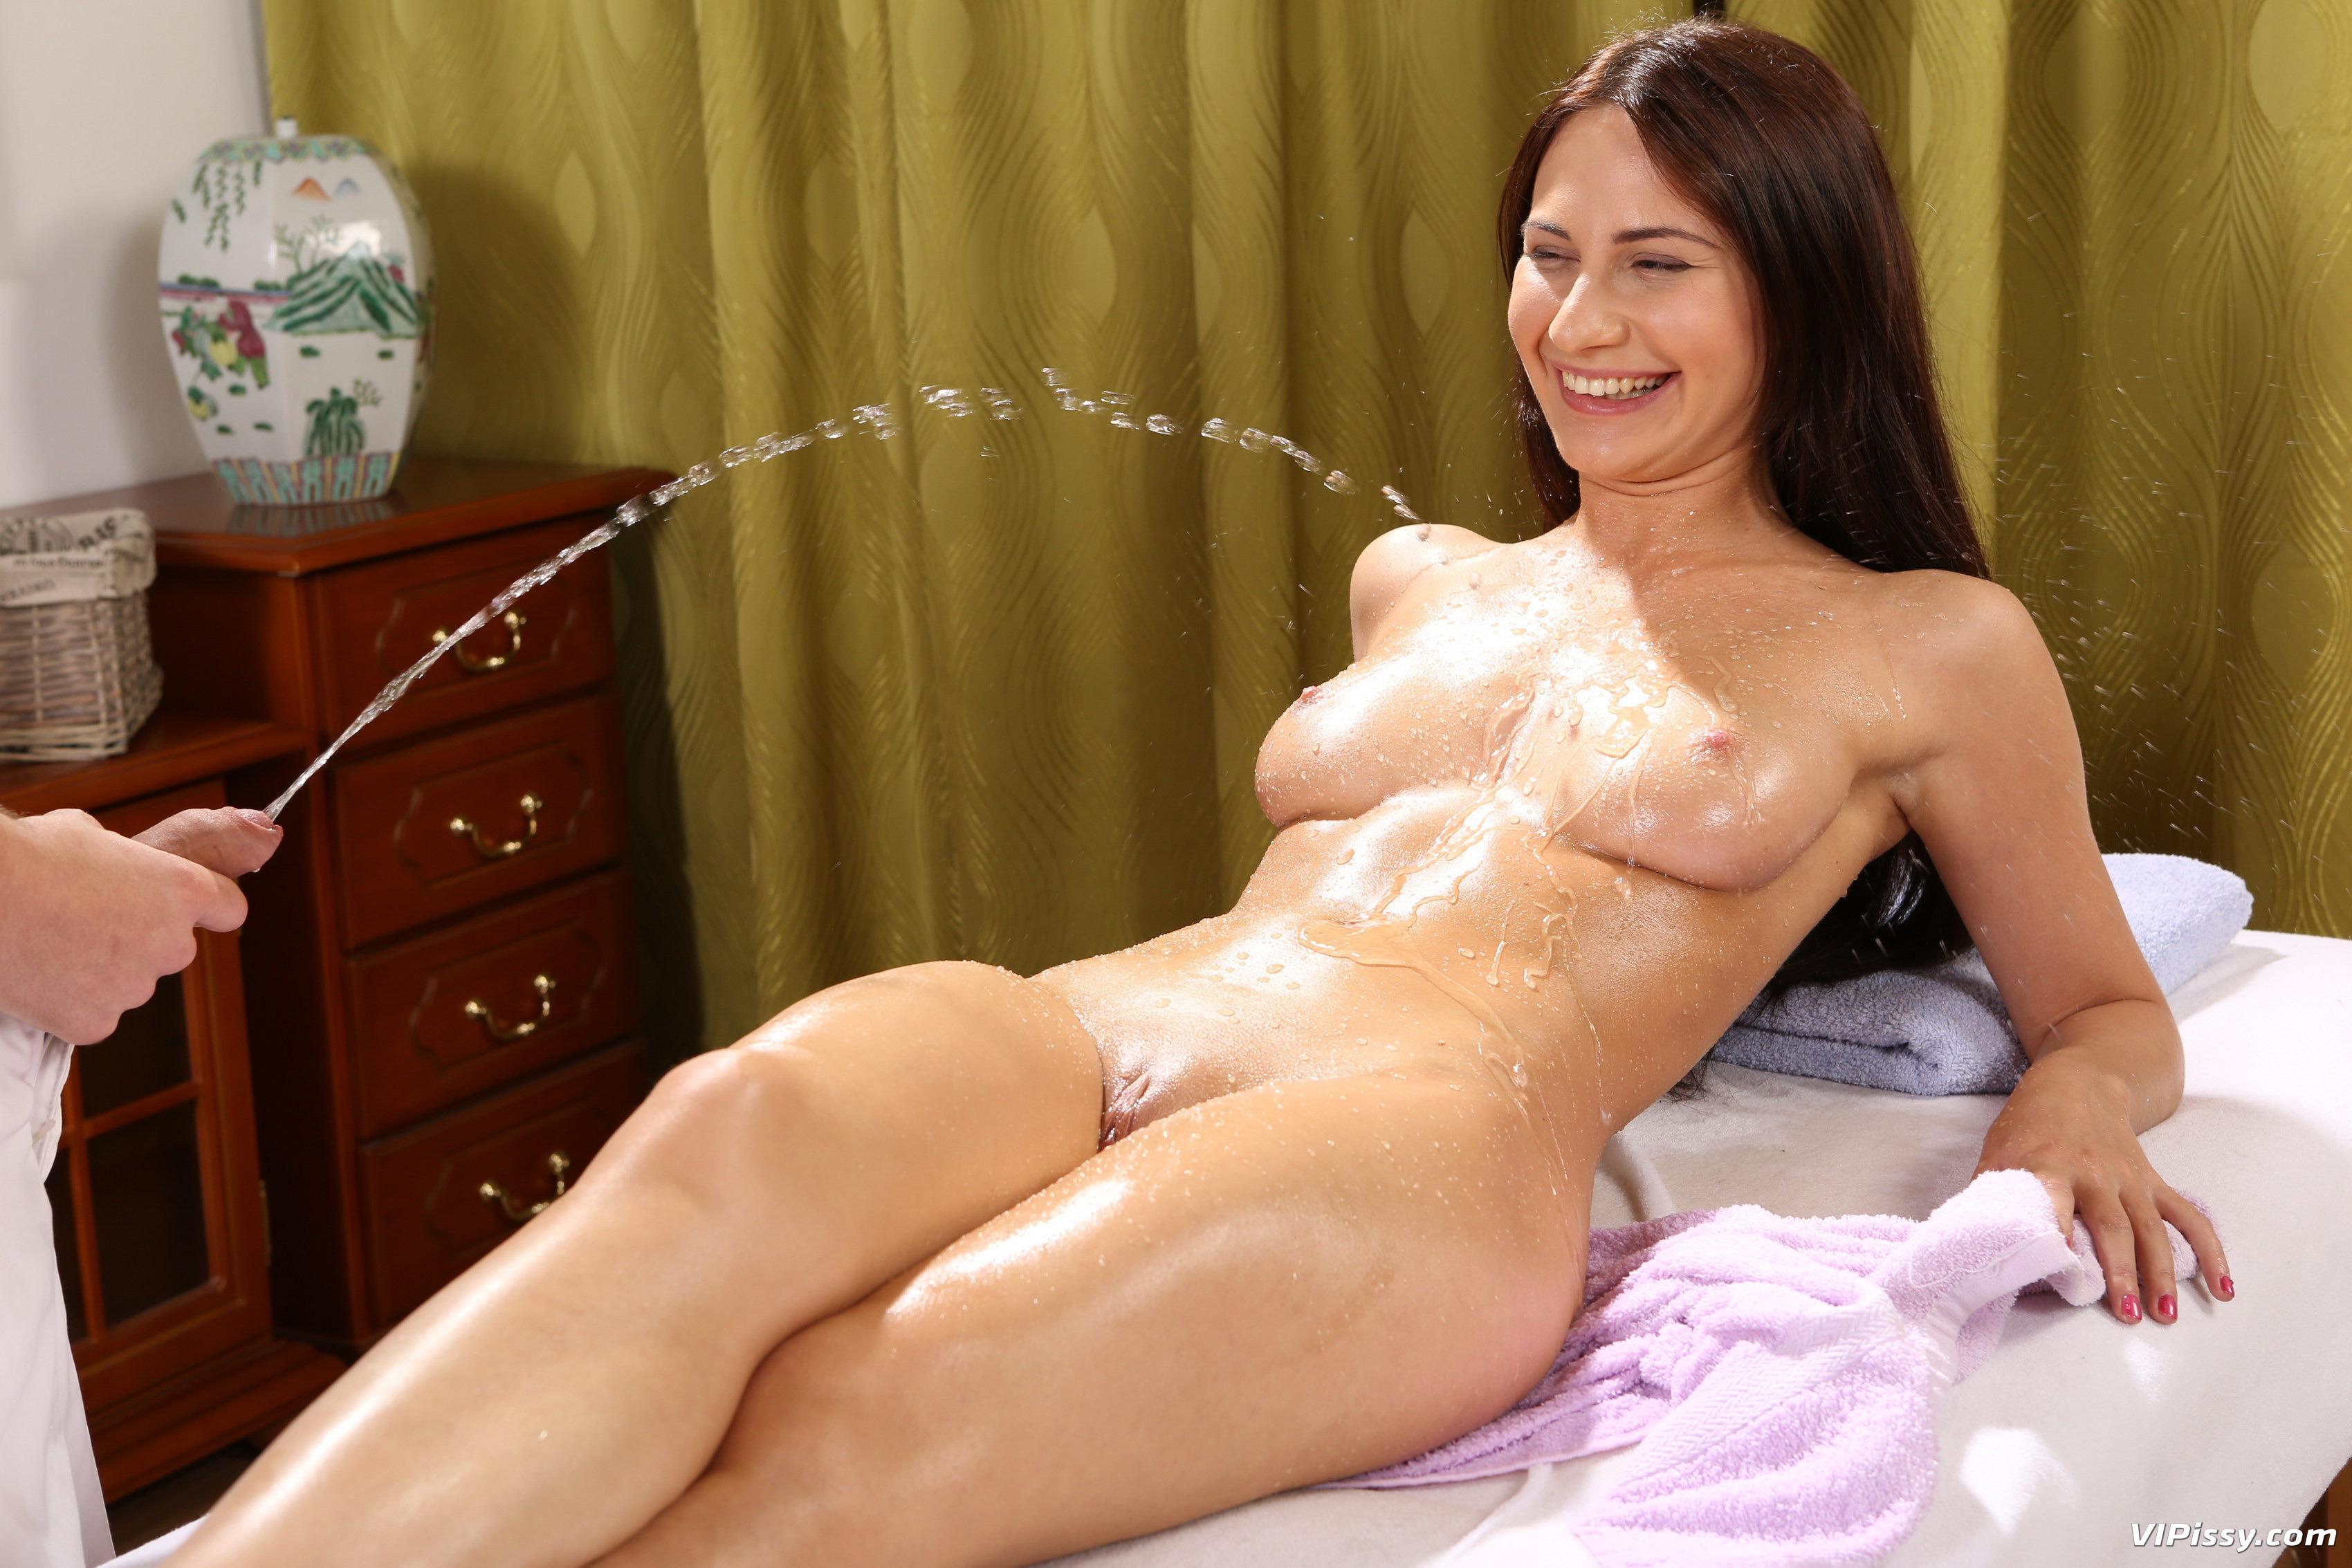 Liza del sierra full service massage 2